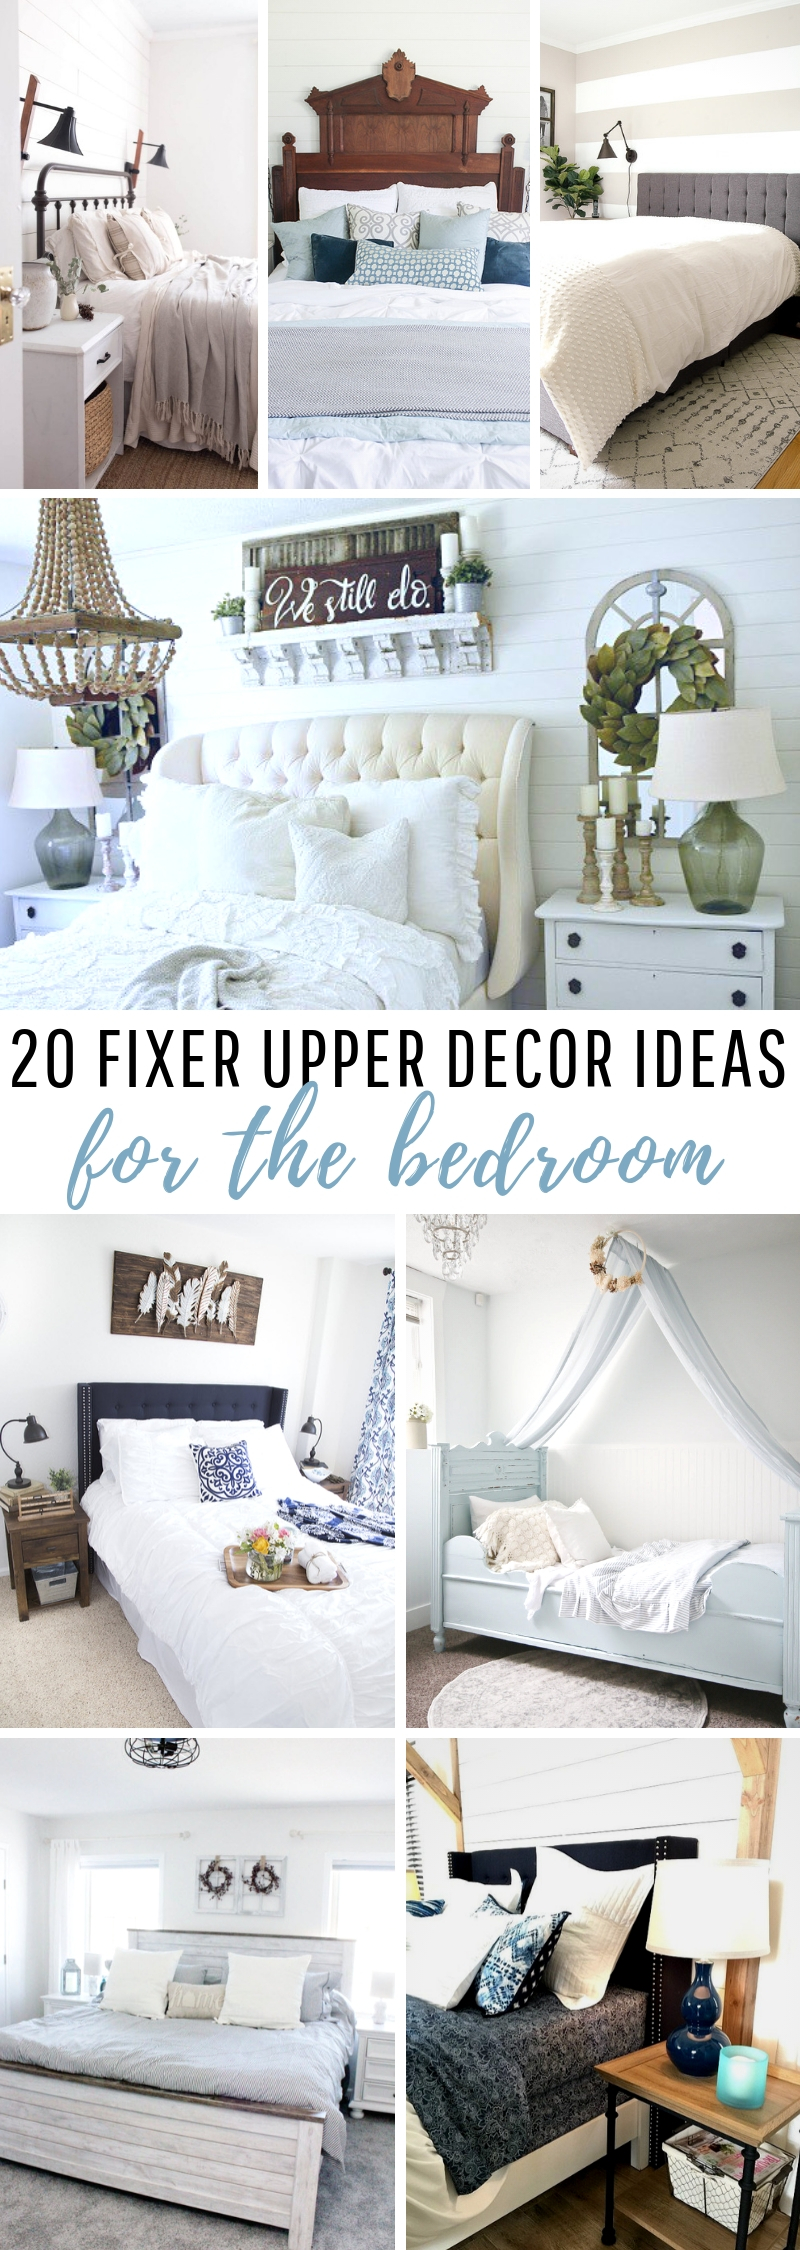 Fixer Upper Decor Ideas for the Bedroom